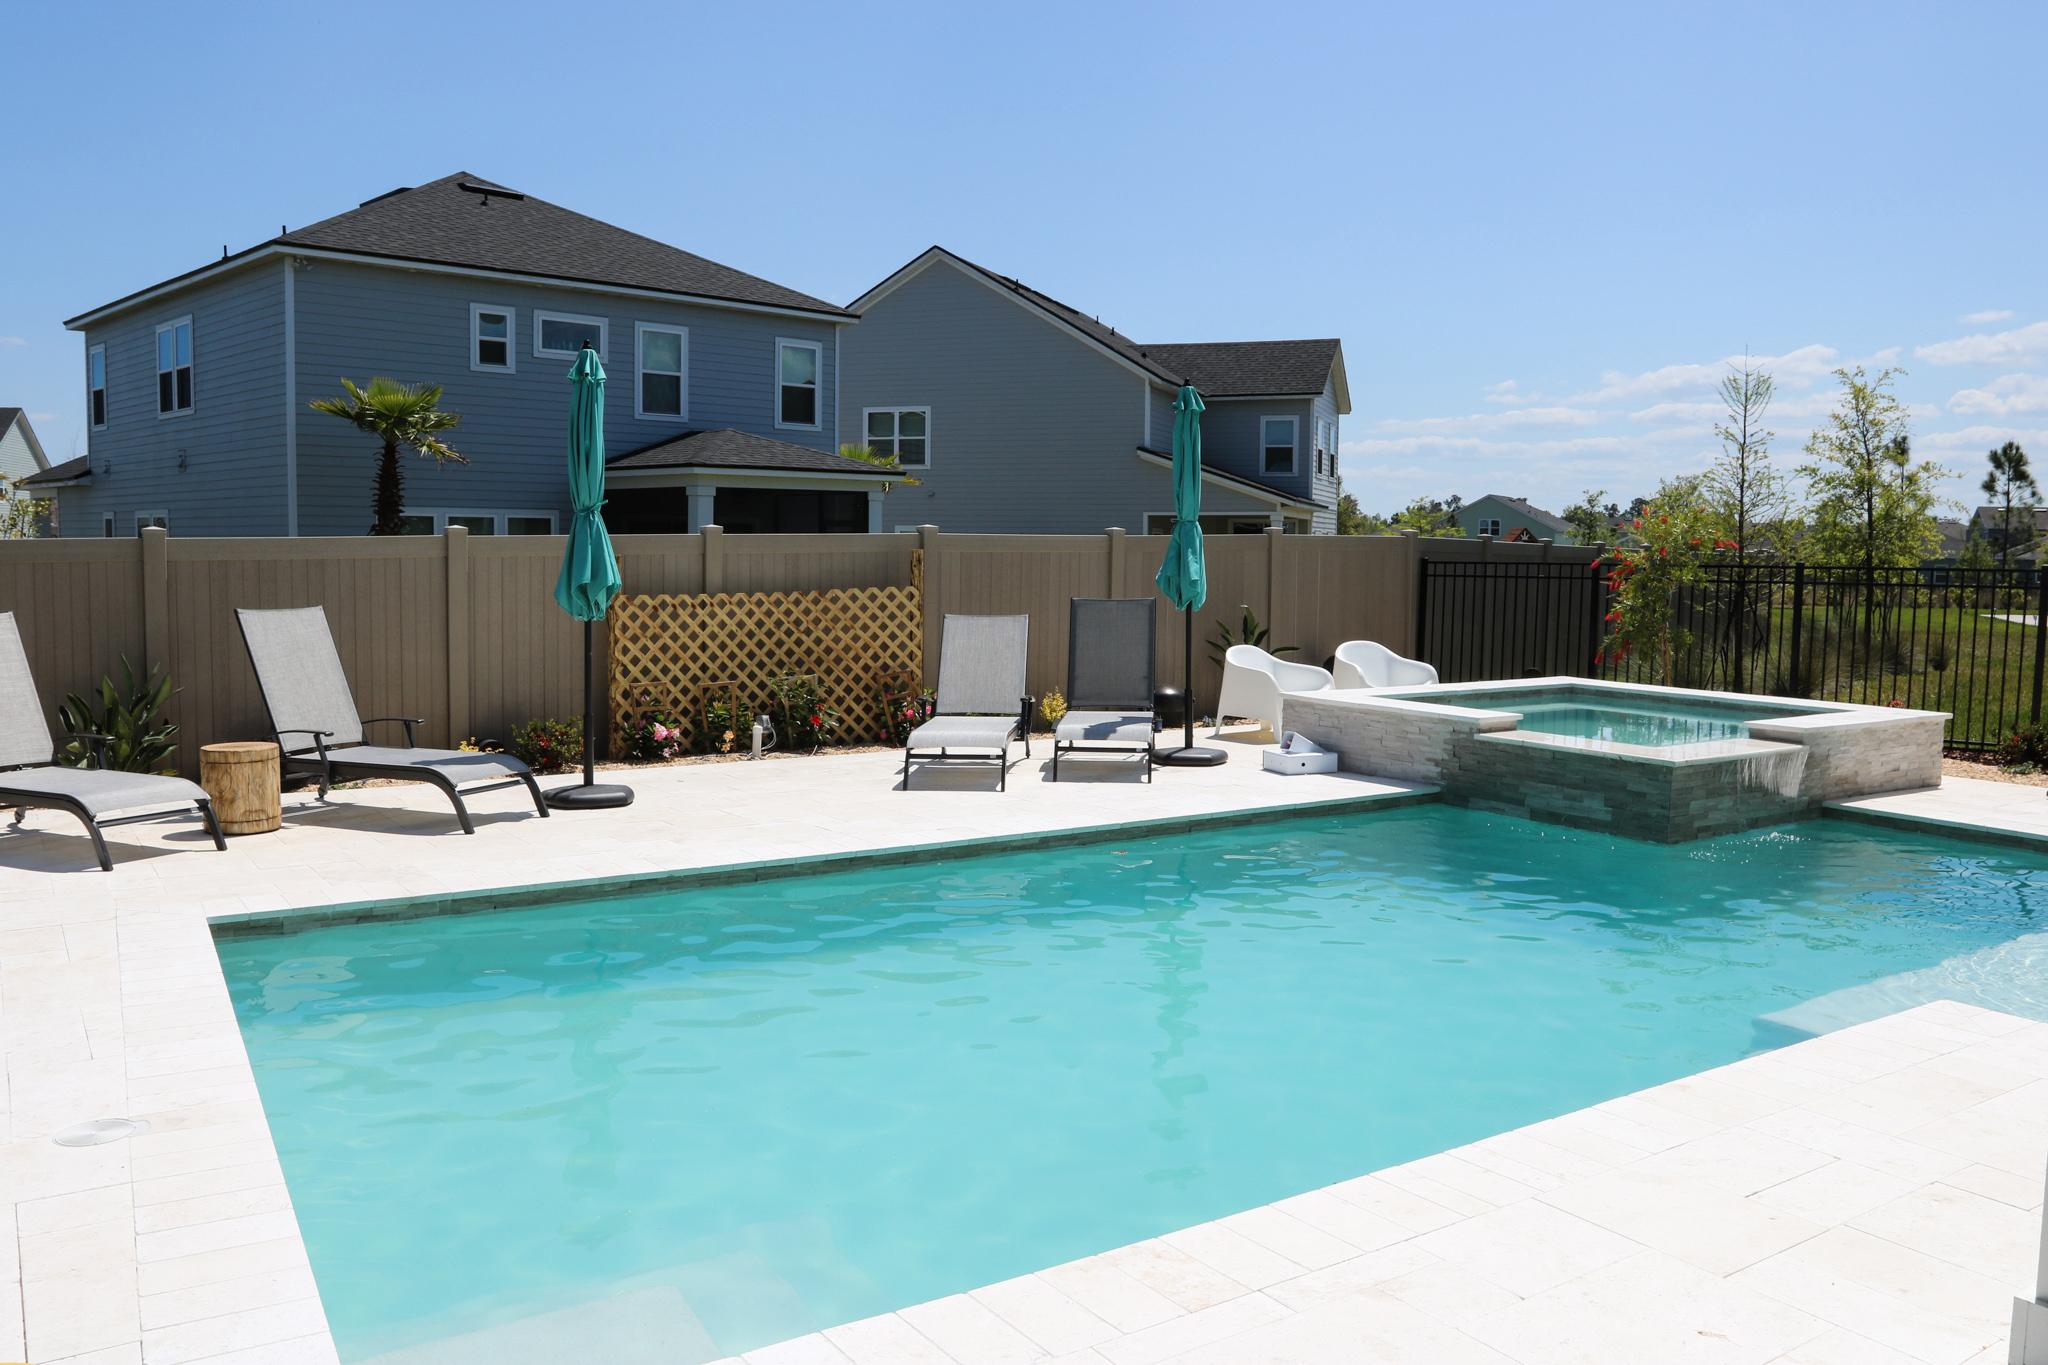 Inground Pool Sun Shelf Pool and Spa Combo